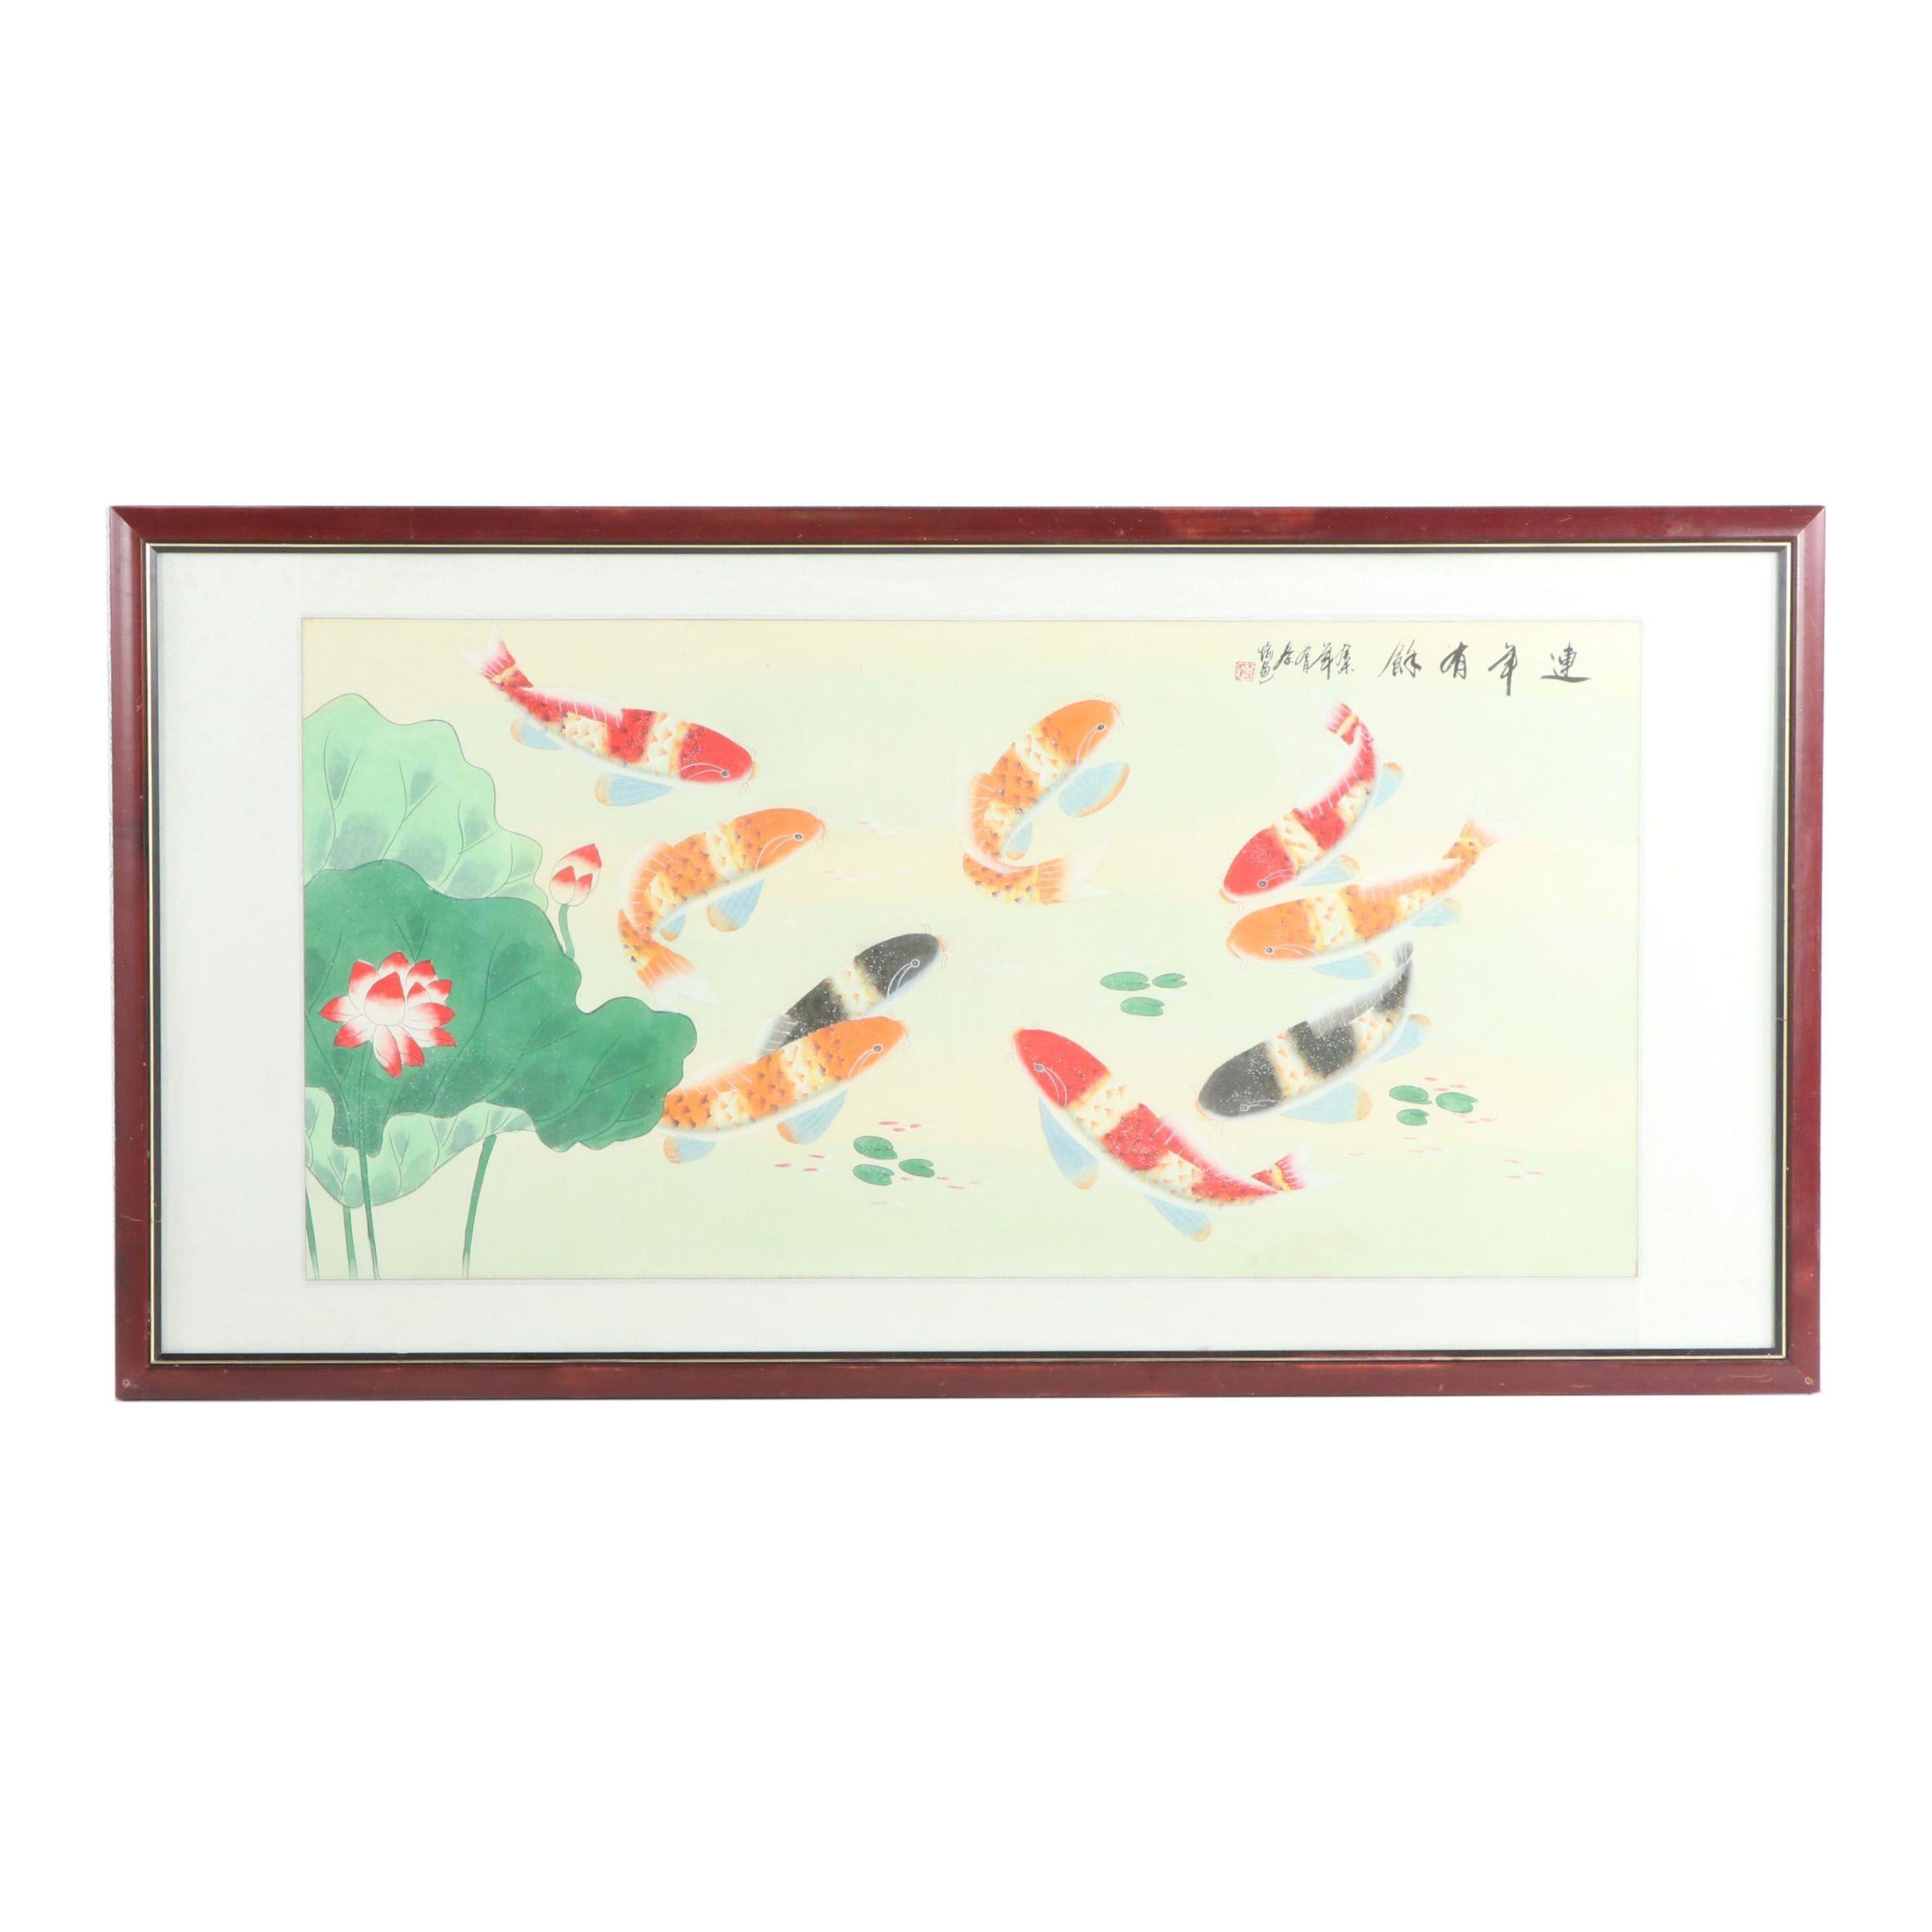 Koi Fish Gouache Painting